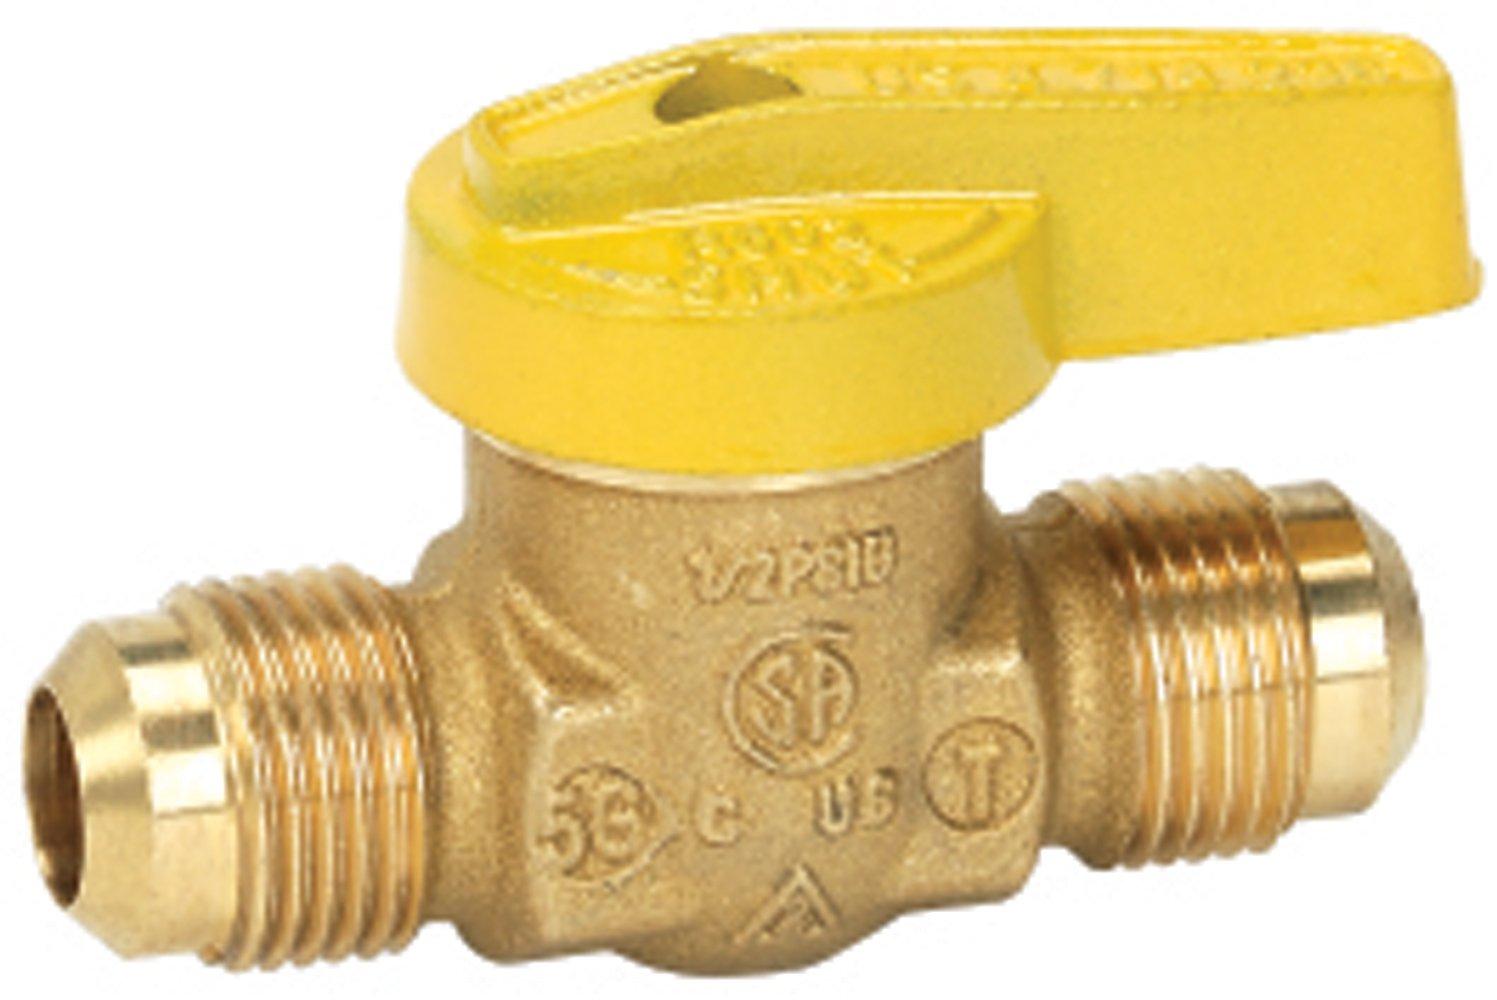 Homewerks VGV-1LH-T2B Premium Gas Ball Valve, Flare x Flare, Brass, 3/8-Inch by Homewerks